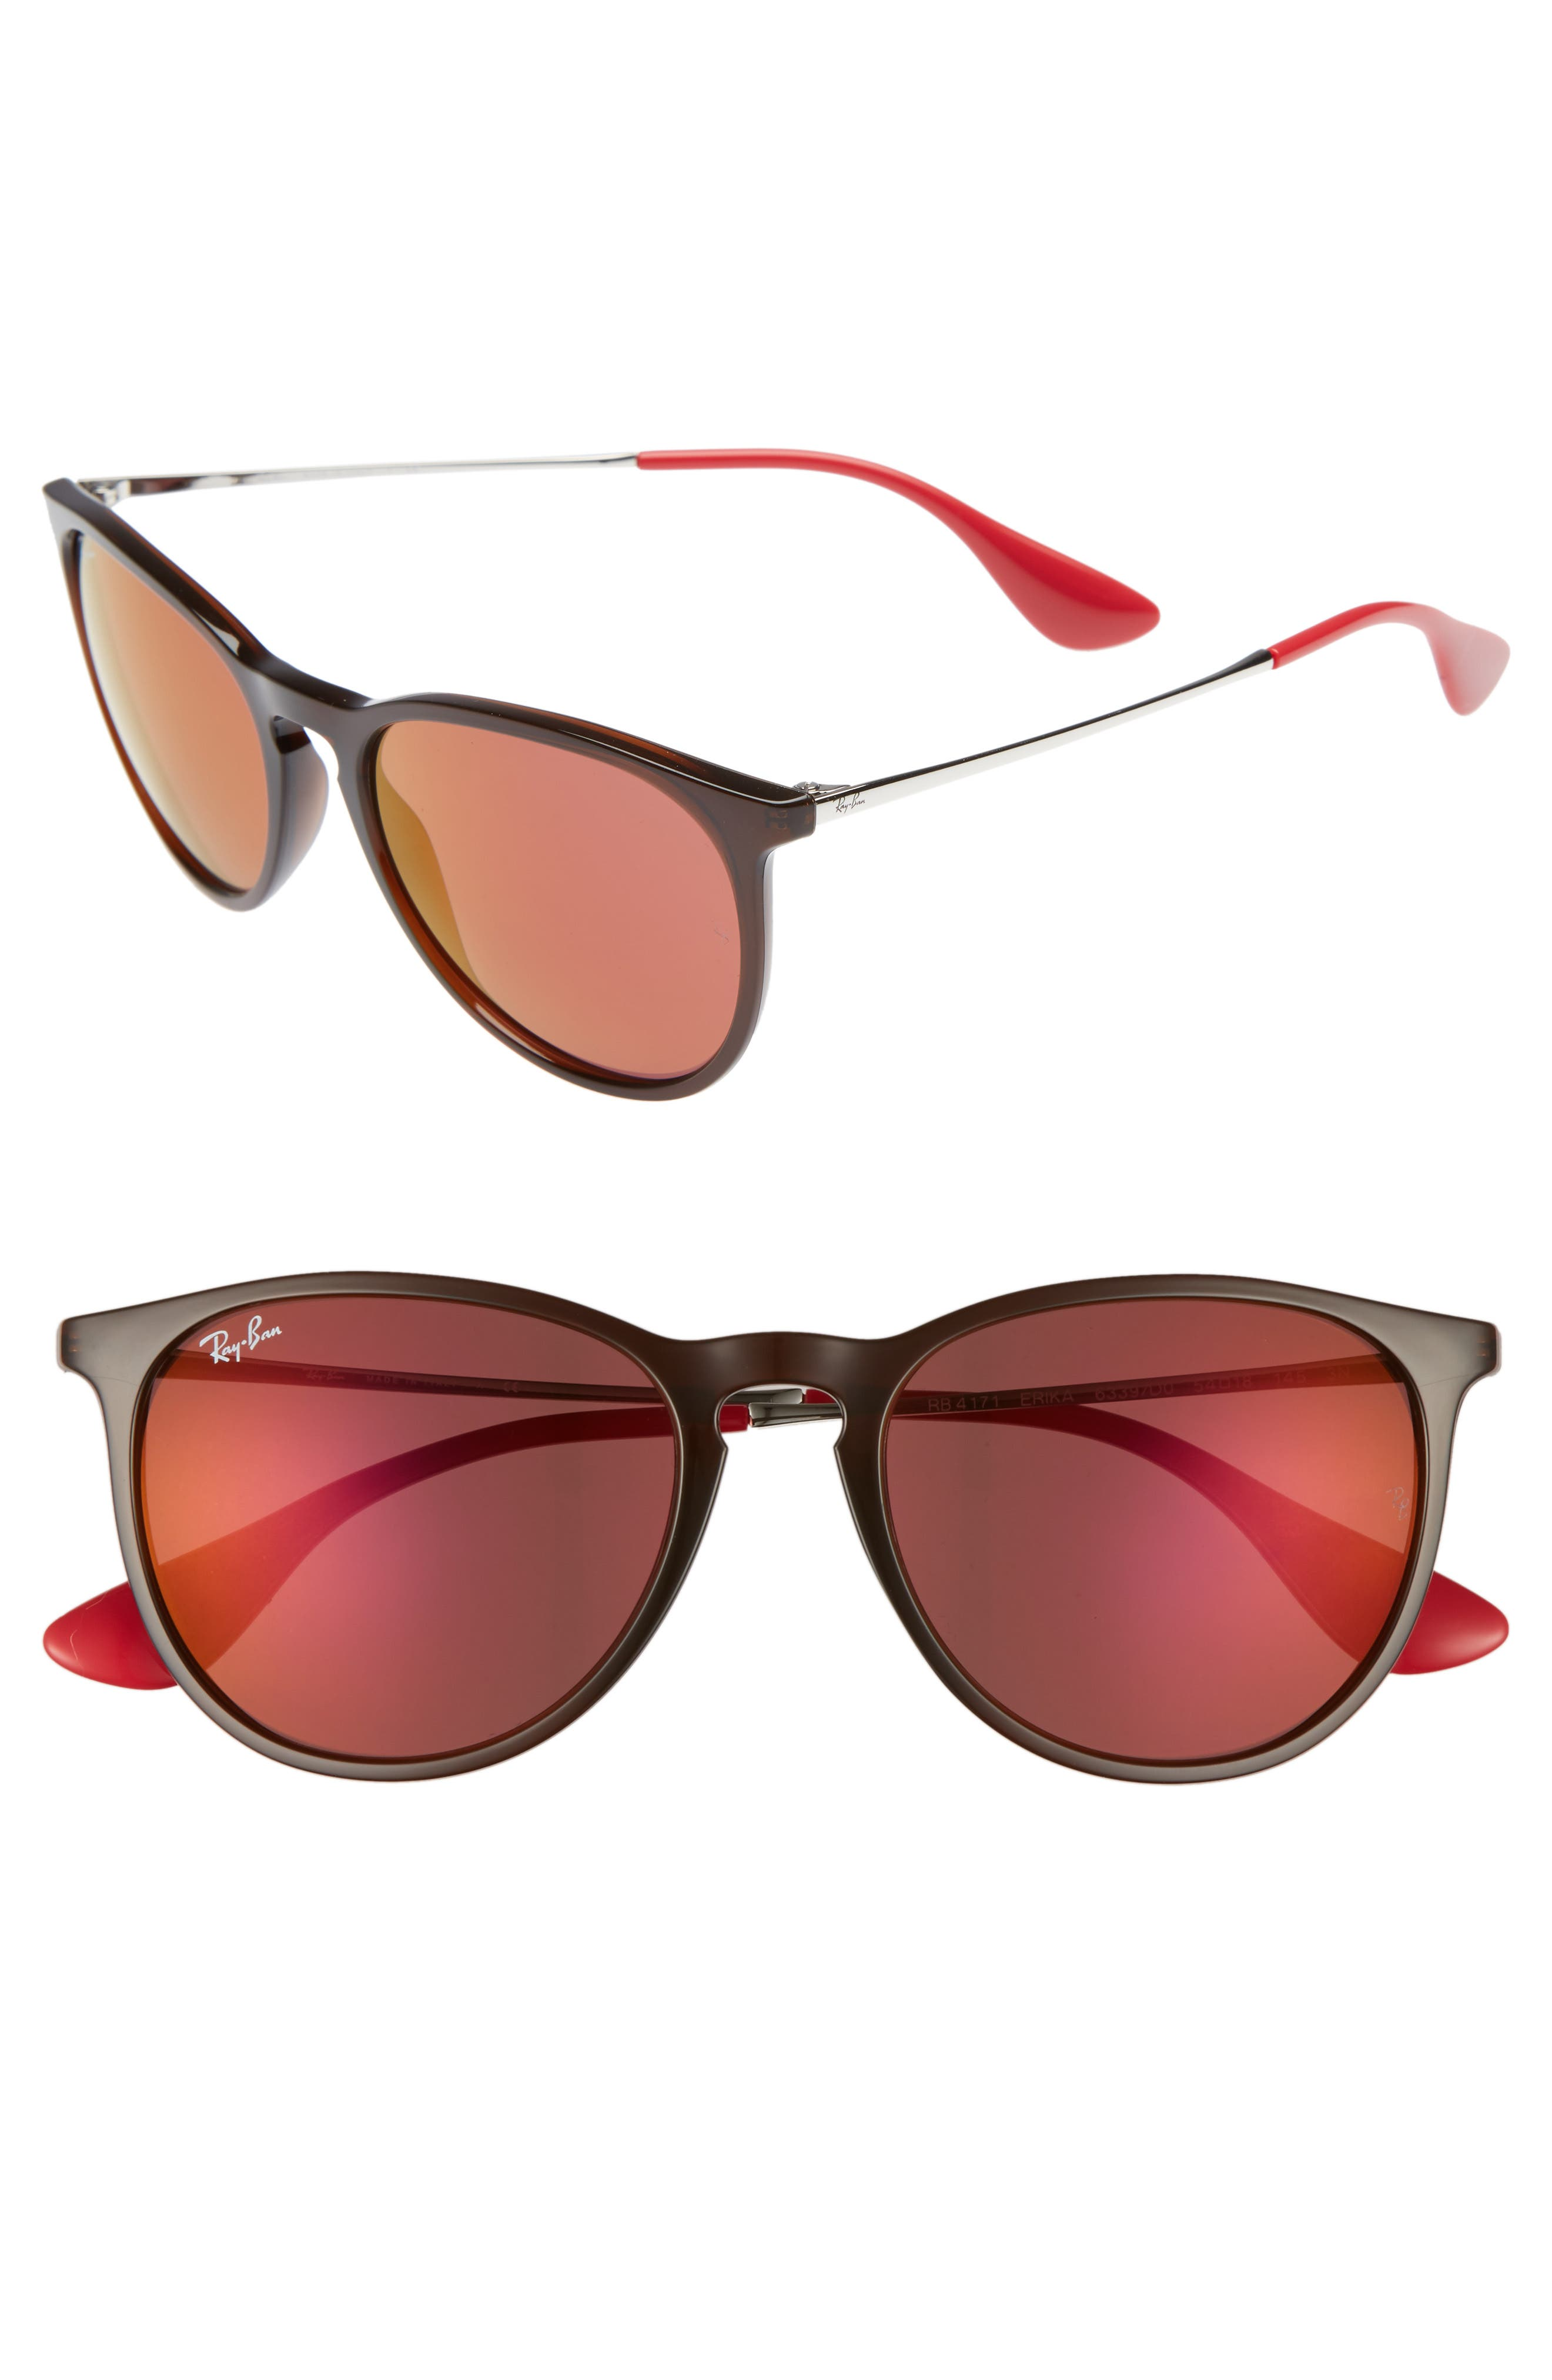 Erika Classic 54mm Sunglasses,                         Main,                         color, Brown